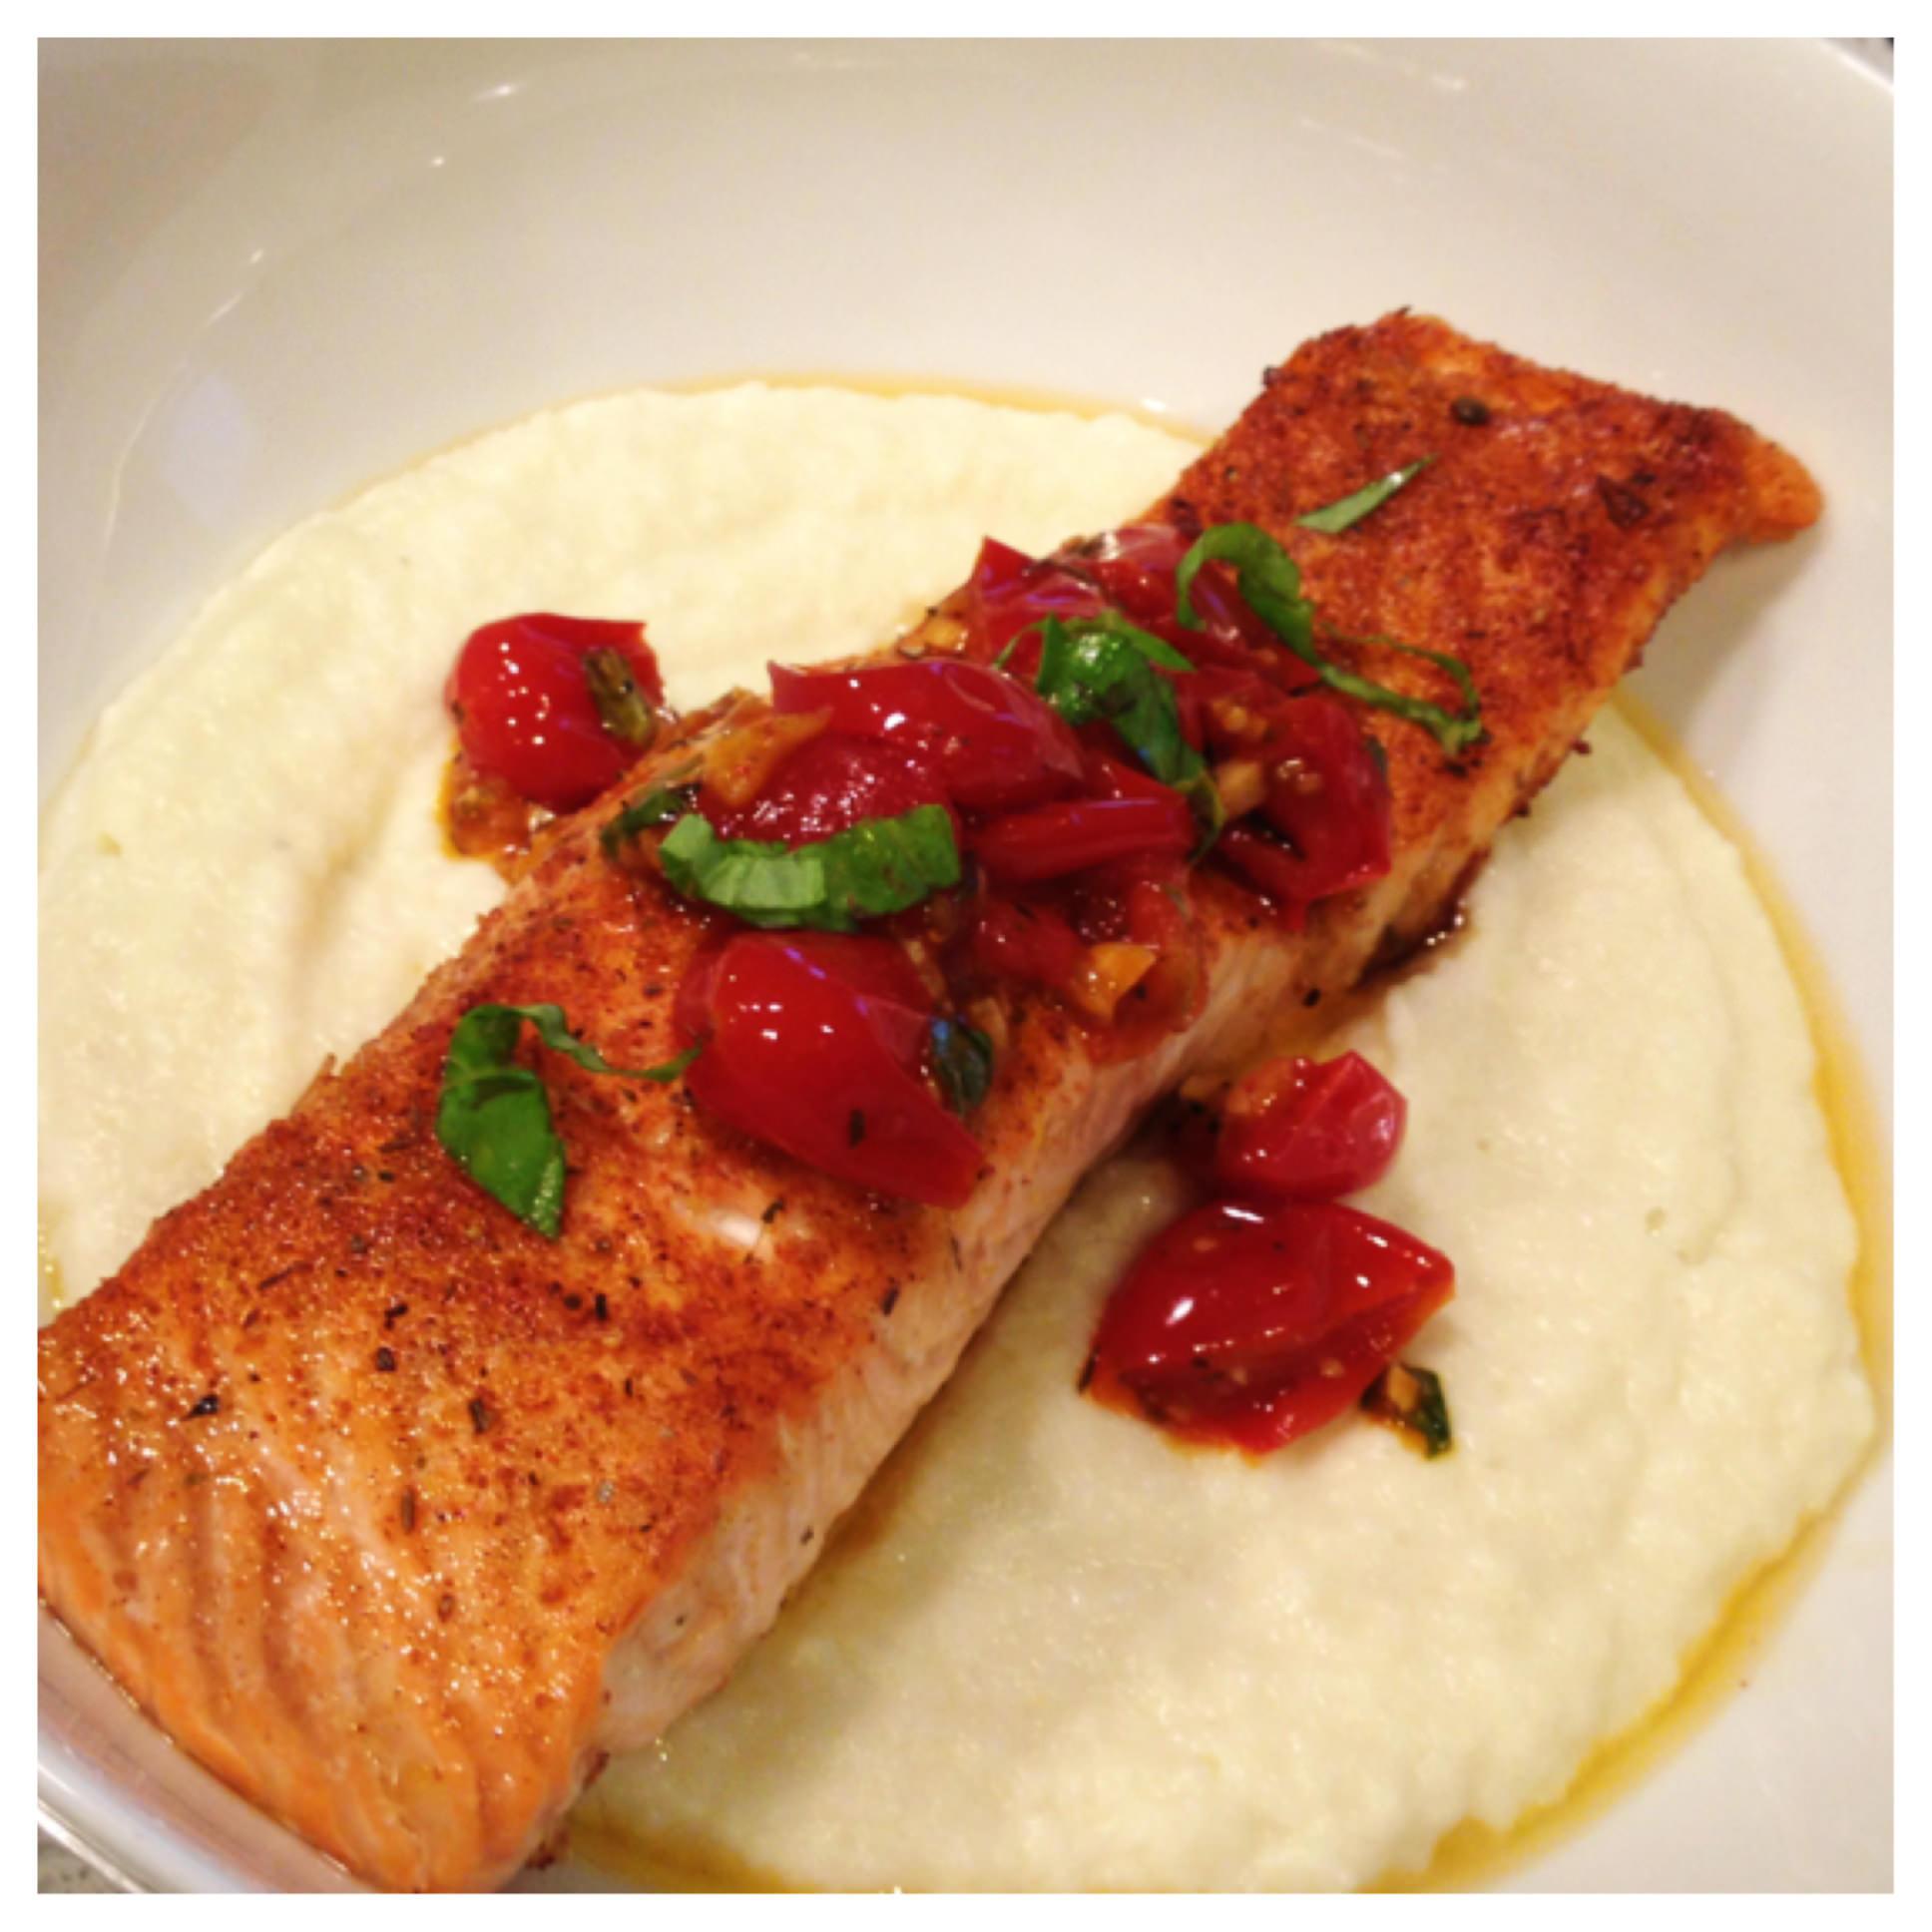 [Recipe] Salmon with CherryTomato Reduction and Cauliflower Coulis